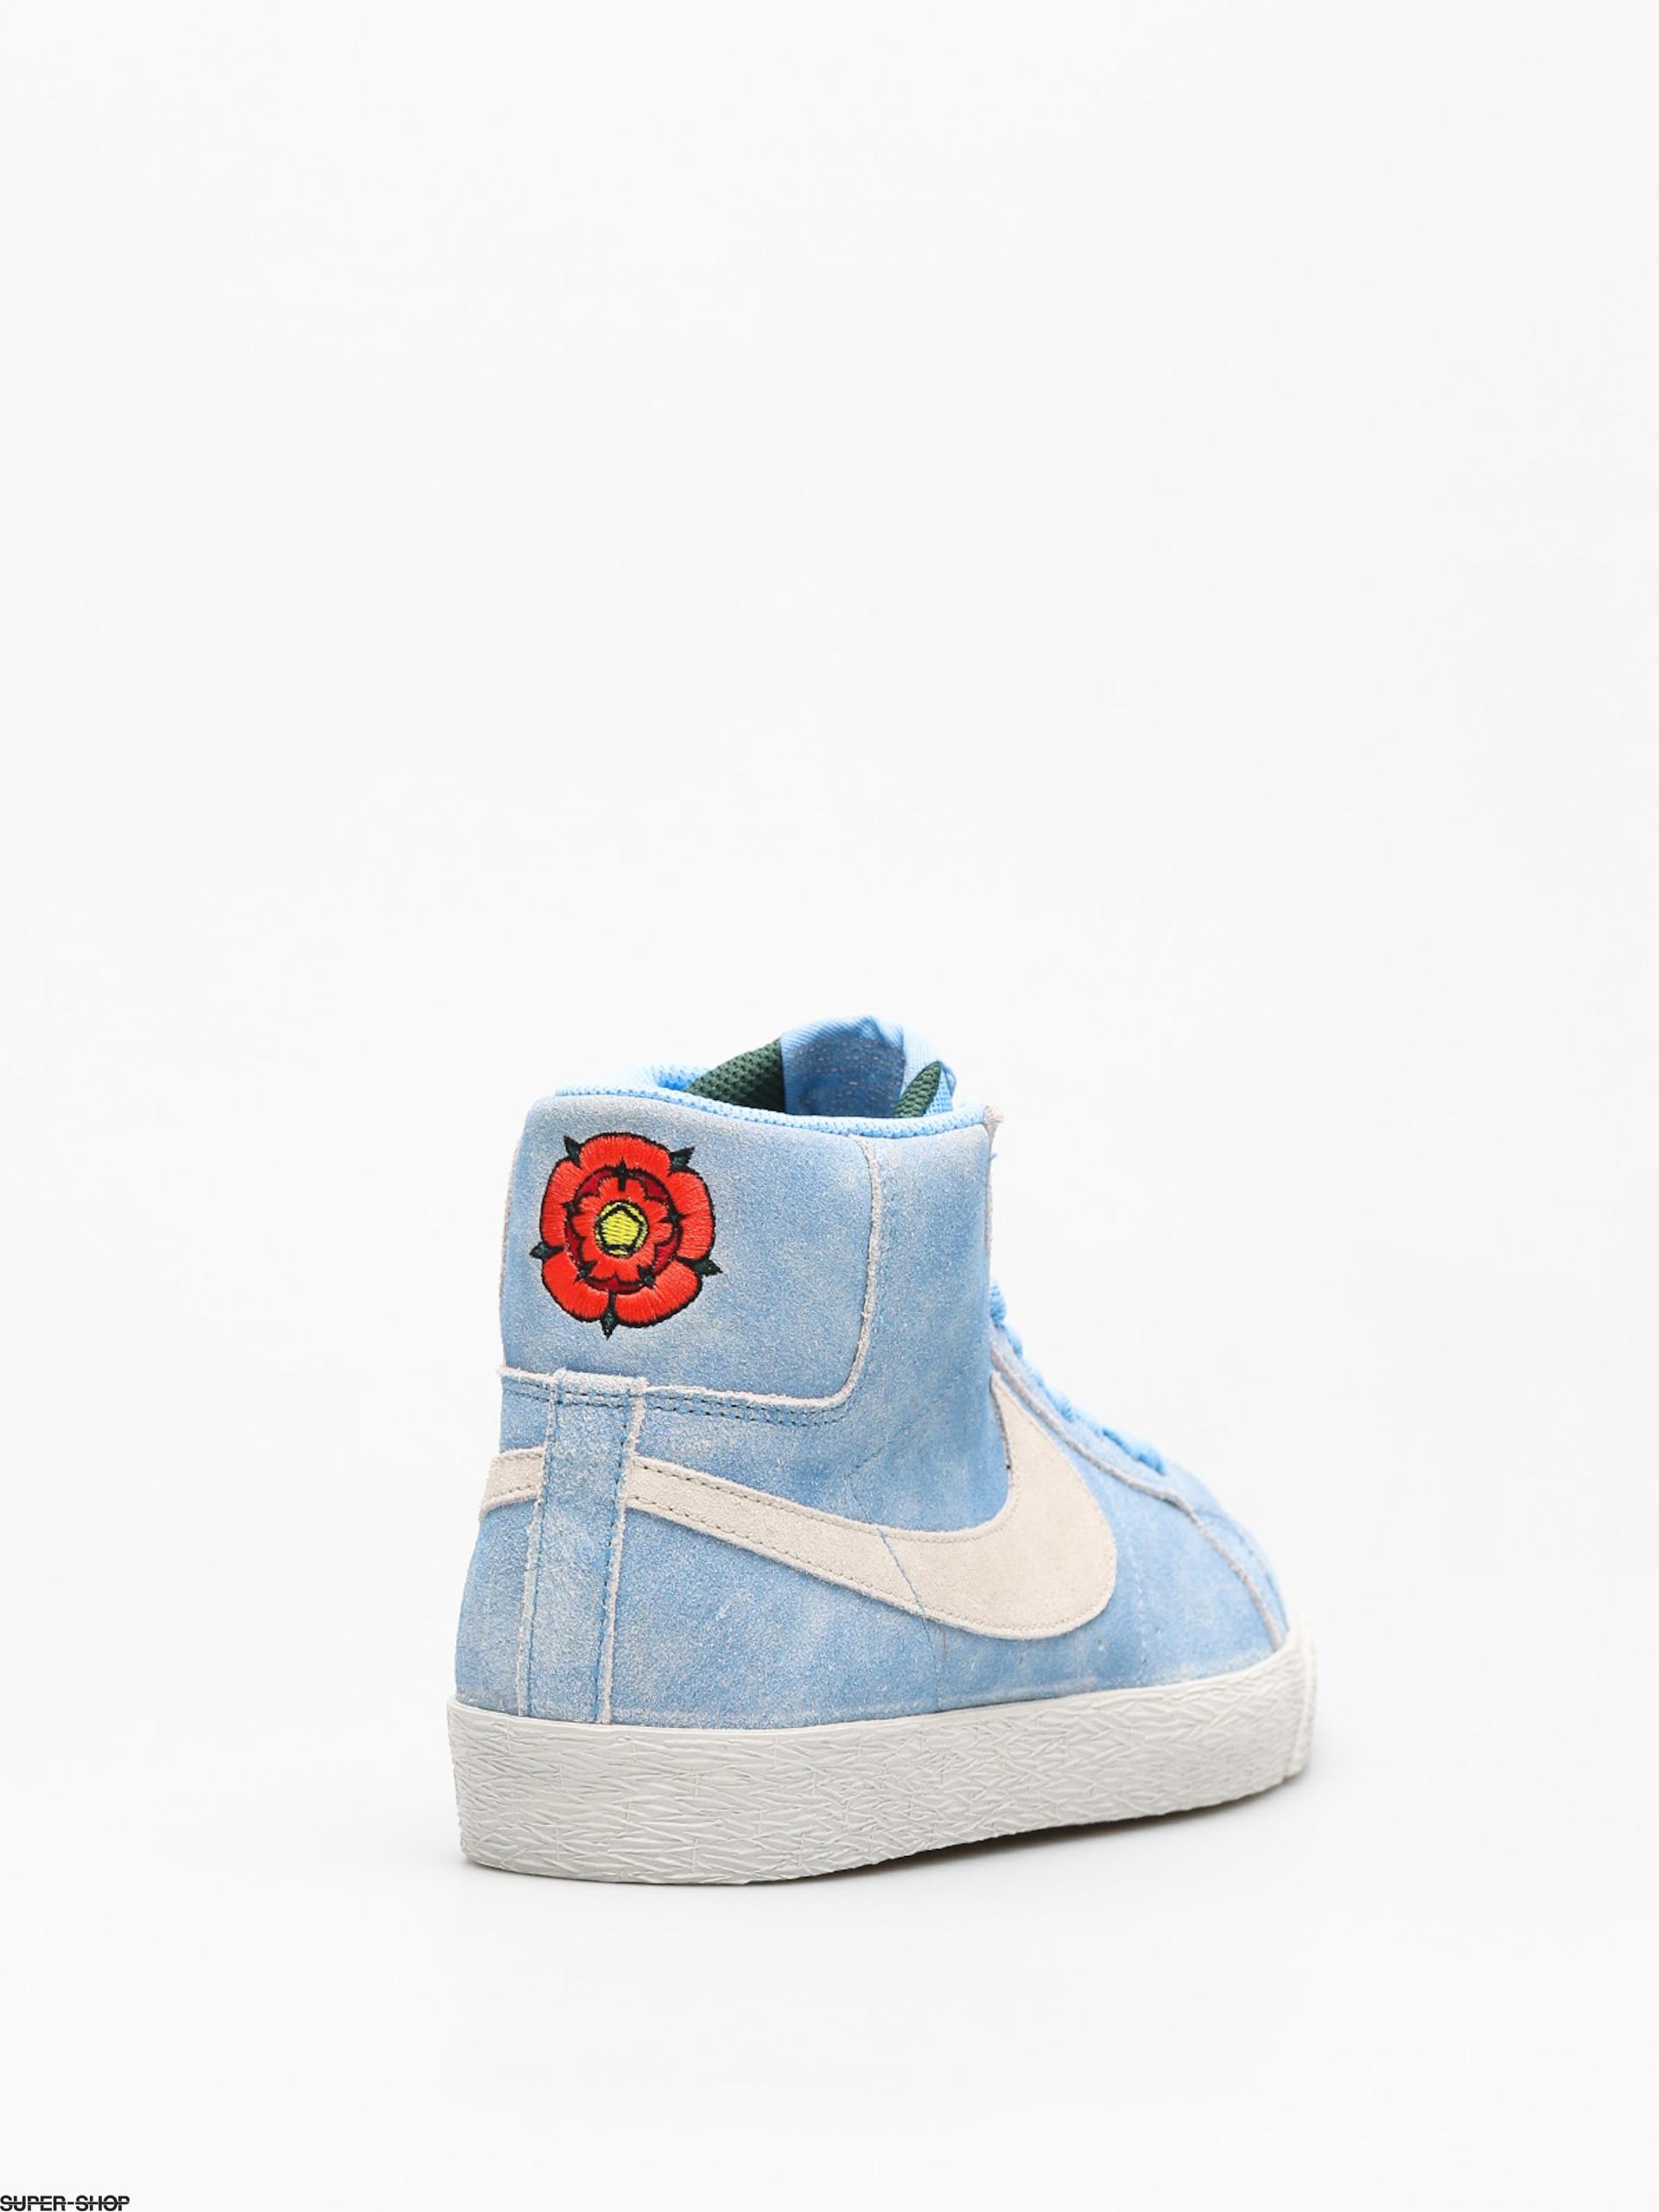 brand new f0f8d 75124 Nike SB Shoes Sb Zoom Blazer Mid (university blue light bone habanero red)